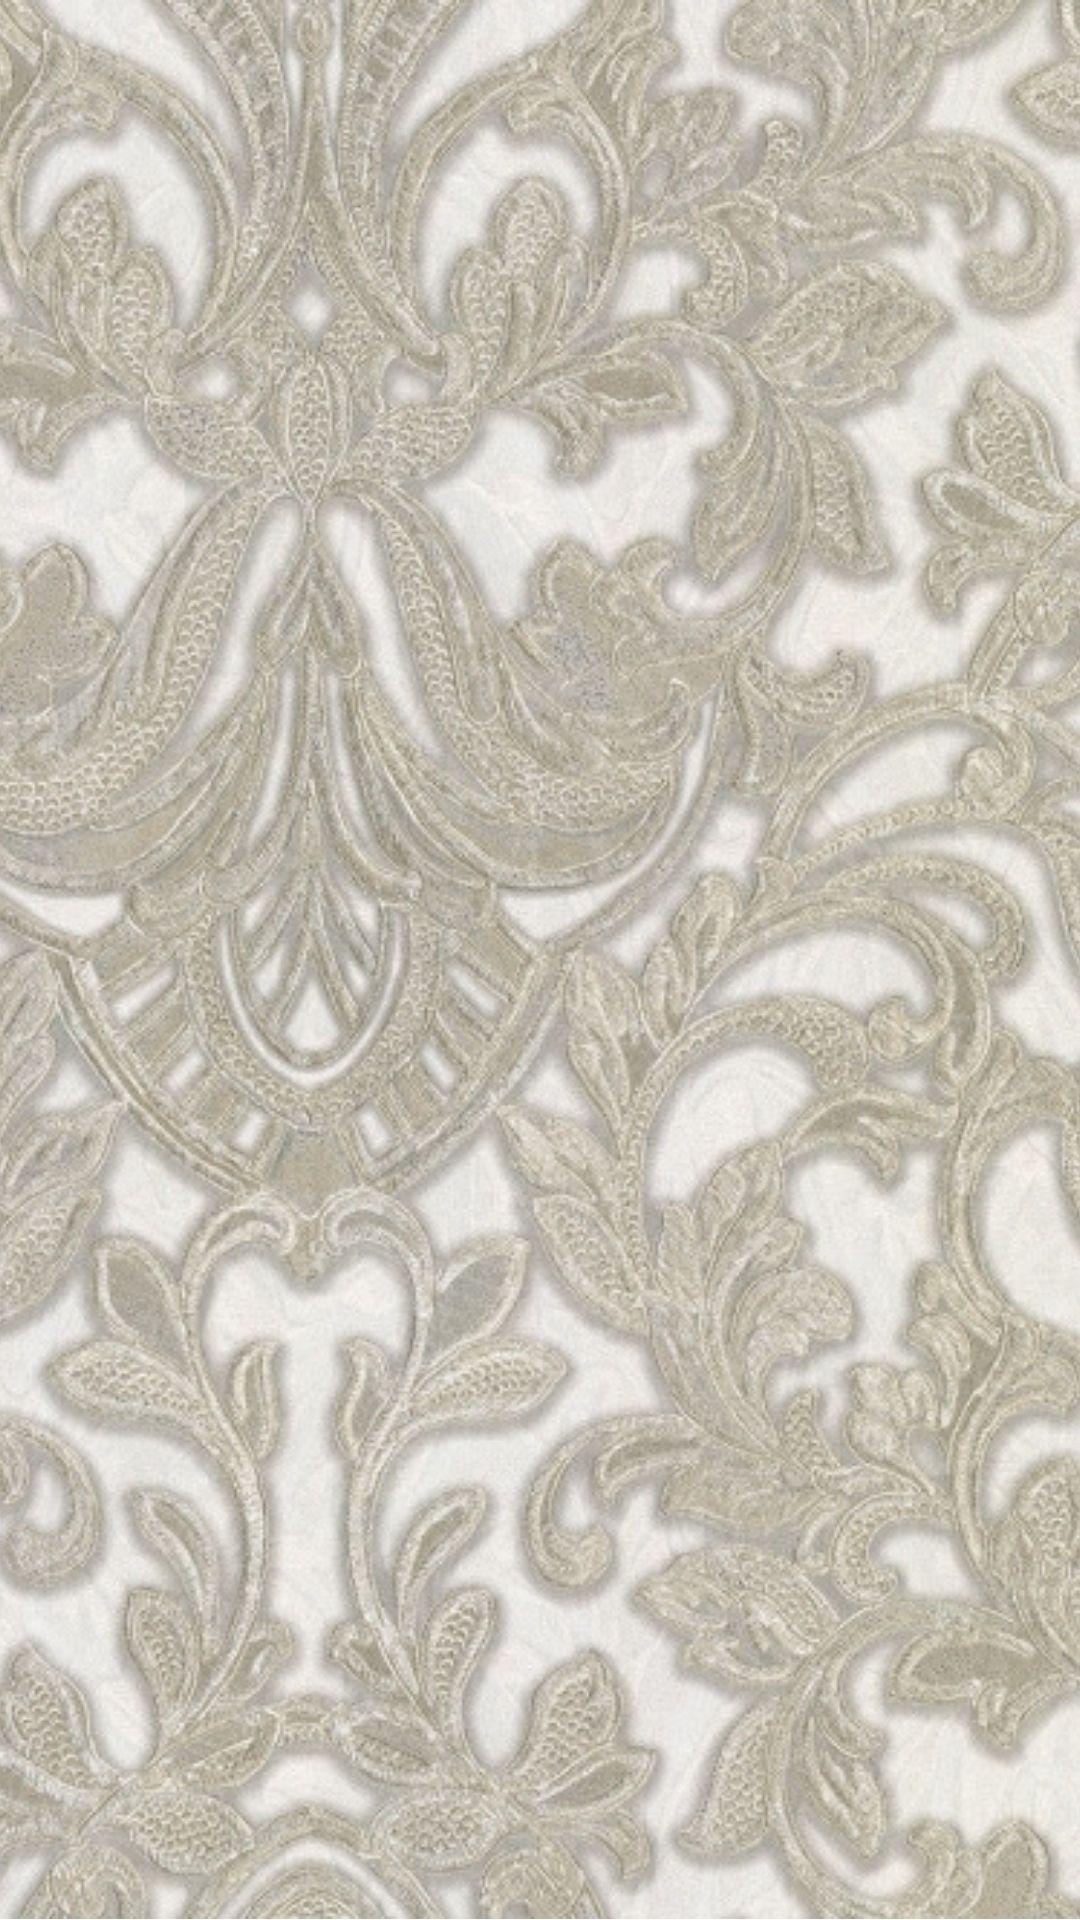 PrimaDonna Damask Wallpaper Beige Cream Gold Damask